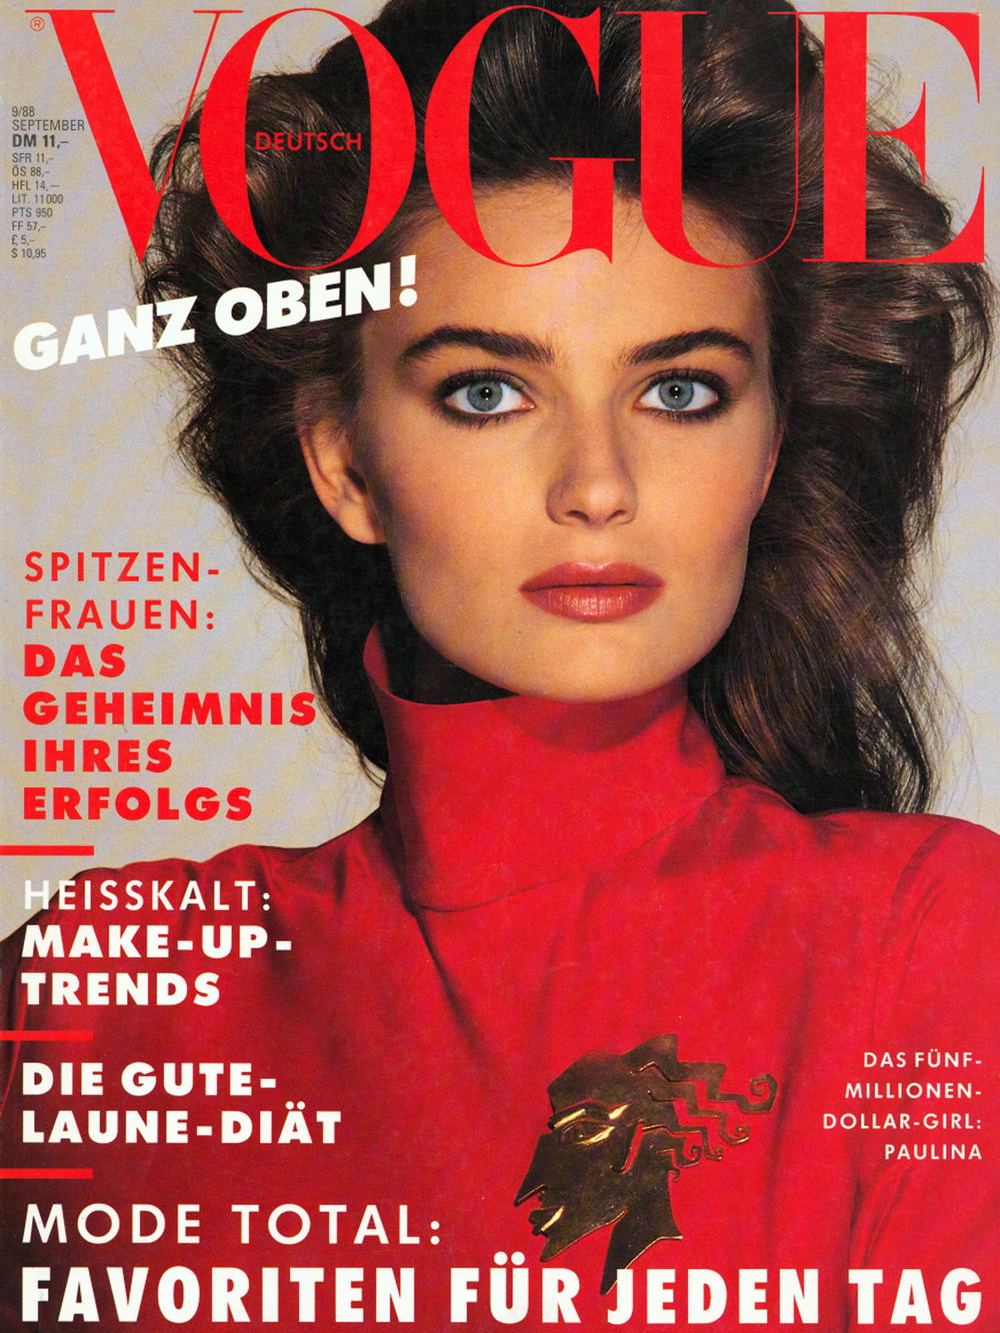 Vogue (Germany) September 1988 | Paulina Porizkova